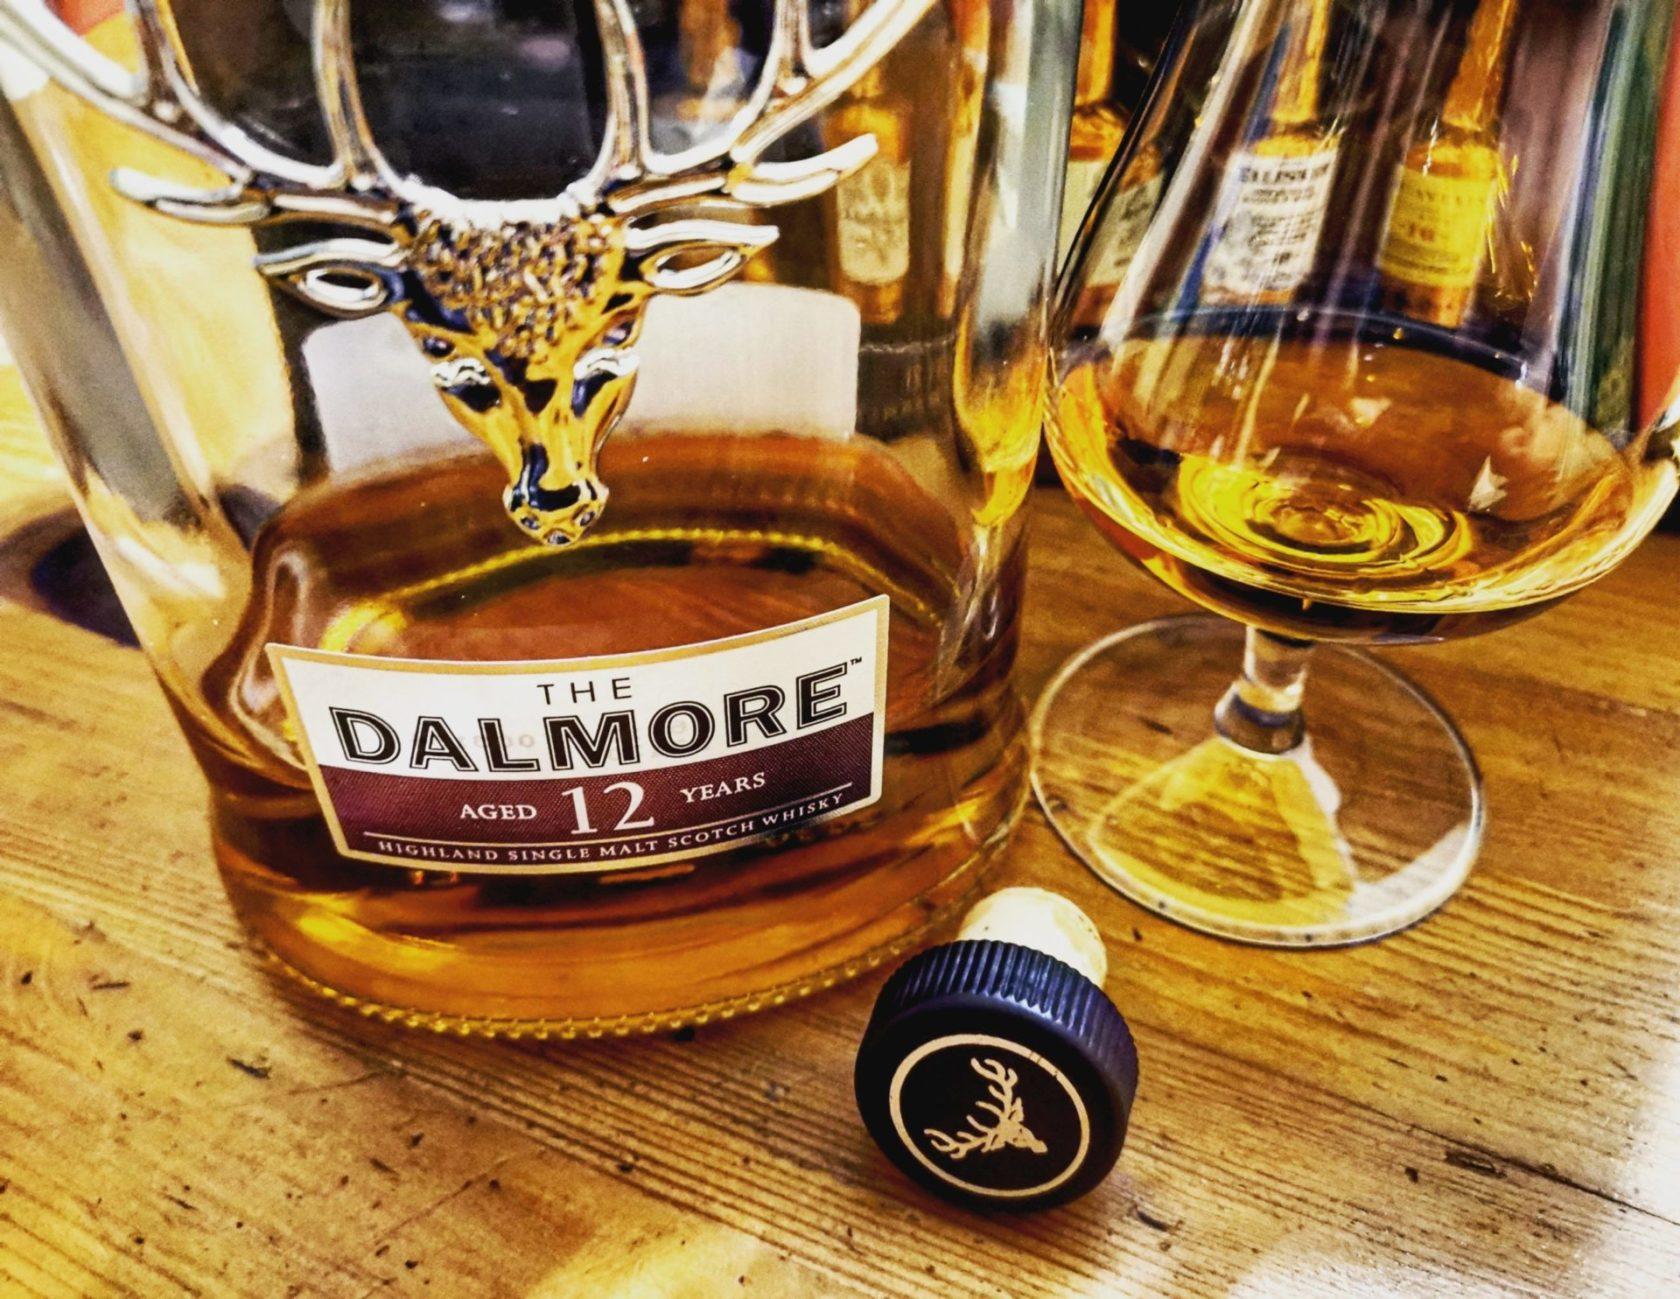 The Dalmore 12 Highland Single Malt Scotch Whisky